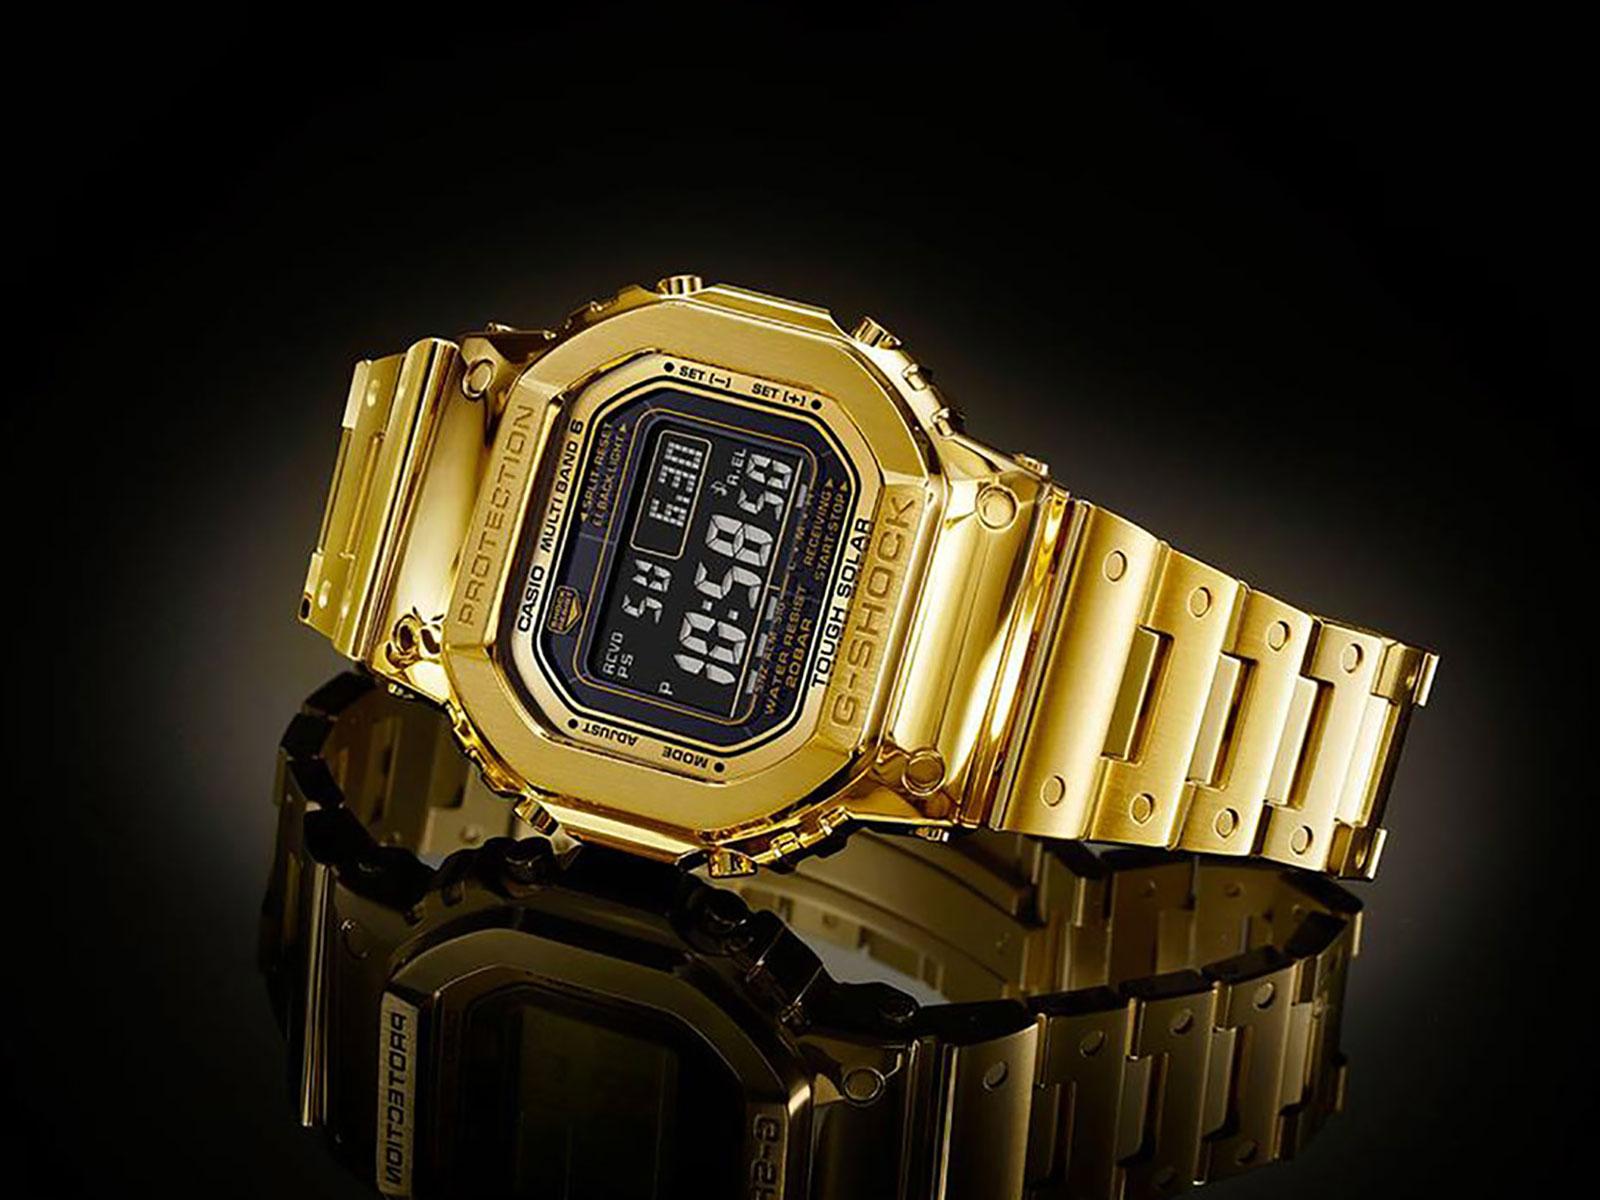 Pure_Gold_G-SHOCK_18k_G-D5000-9JR-2.